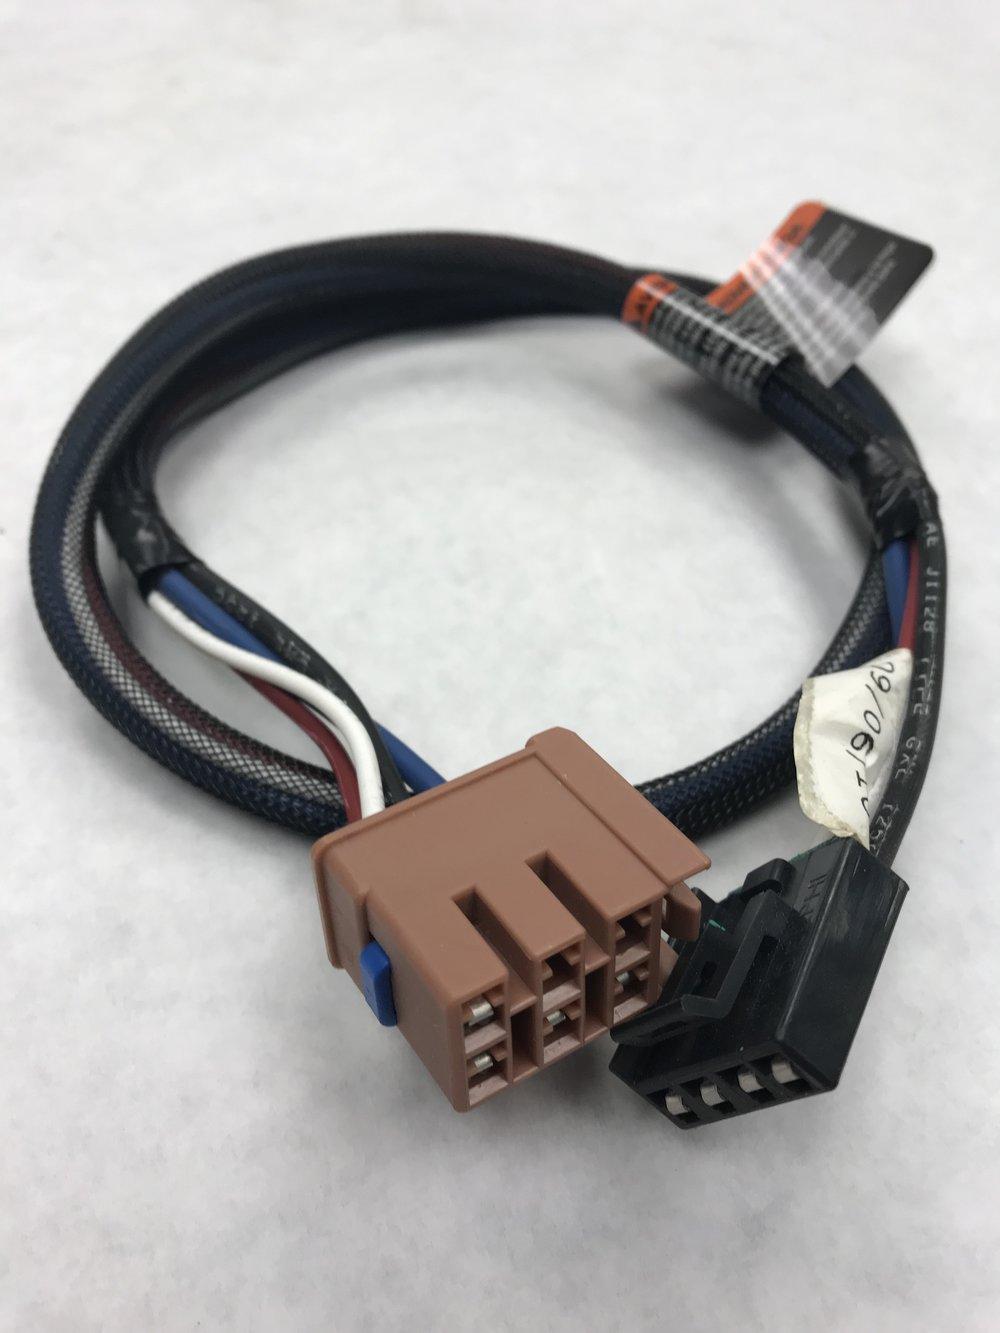 Tekonsha 3025 P Brake Control Wiring Adapter For Gm Christmas Gift Shop Controller